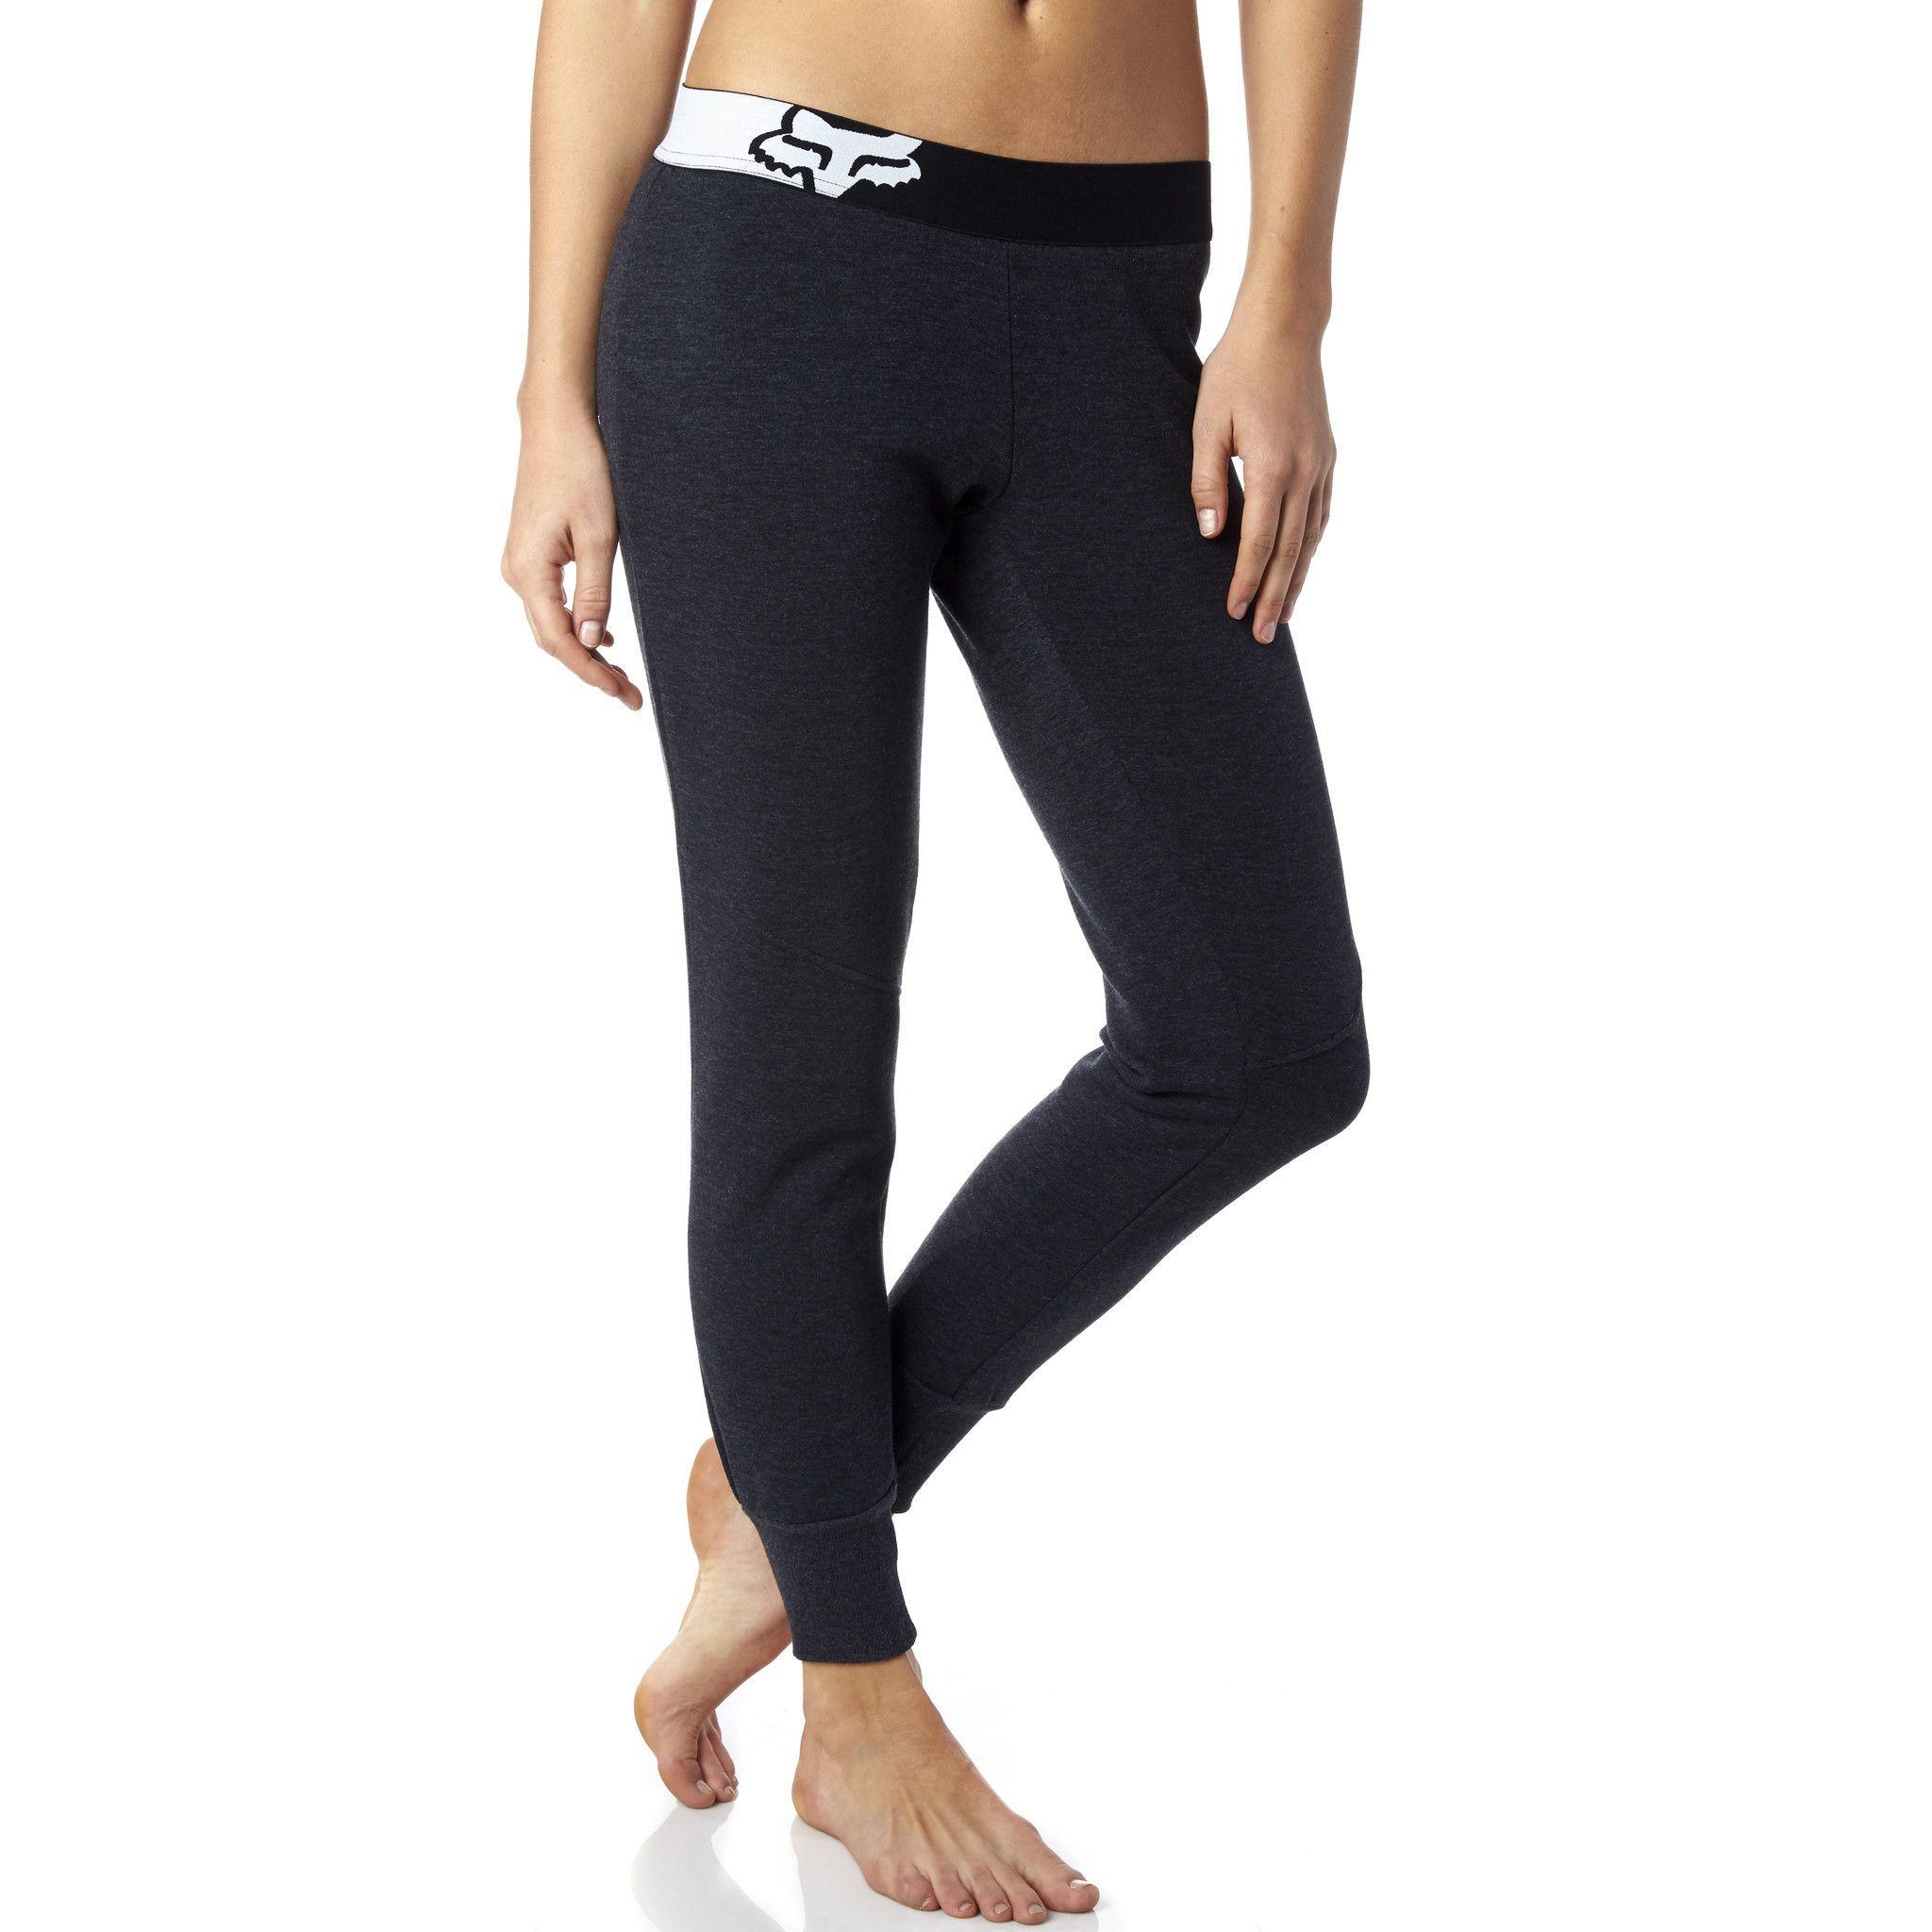 Fox Sweatpants for Boys & Girls Fleece Active Joggers Elastic Pants  Clothing Pants